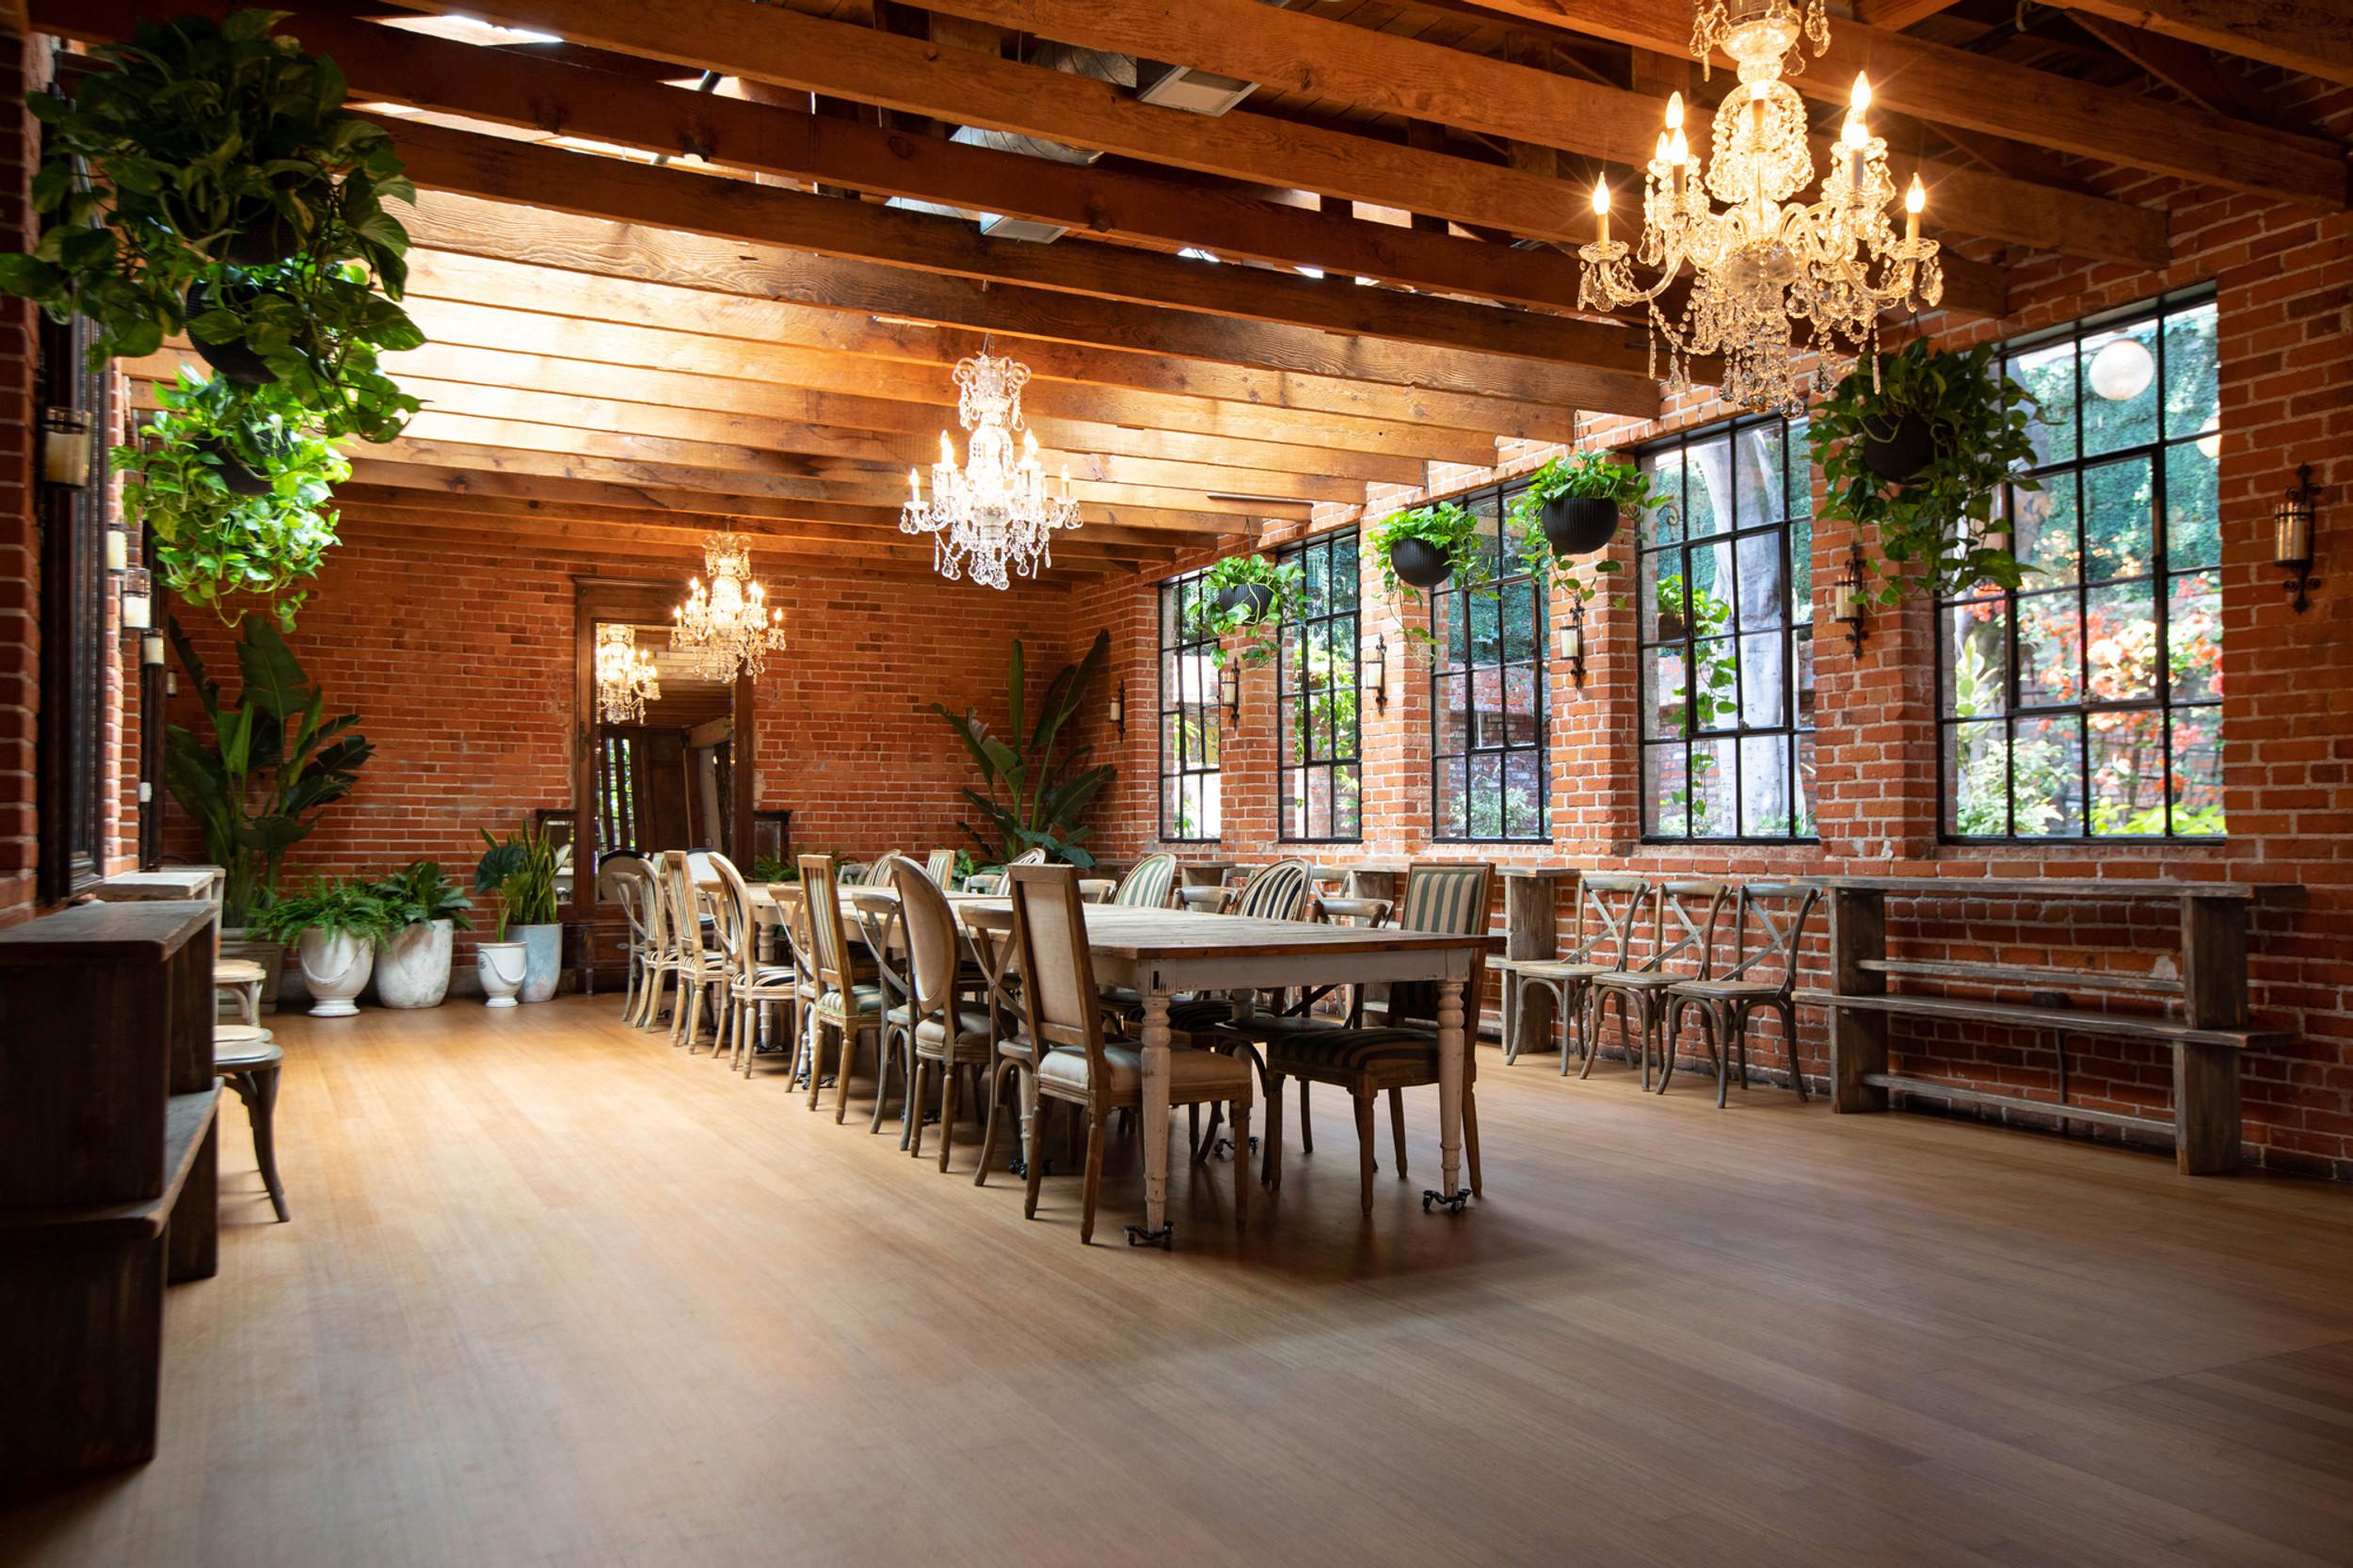 Los Angeles Wedding Events Venue Carondelet House